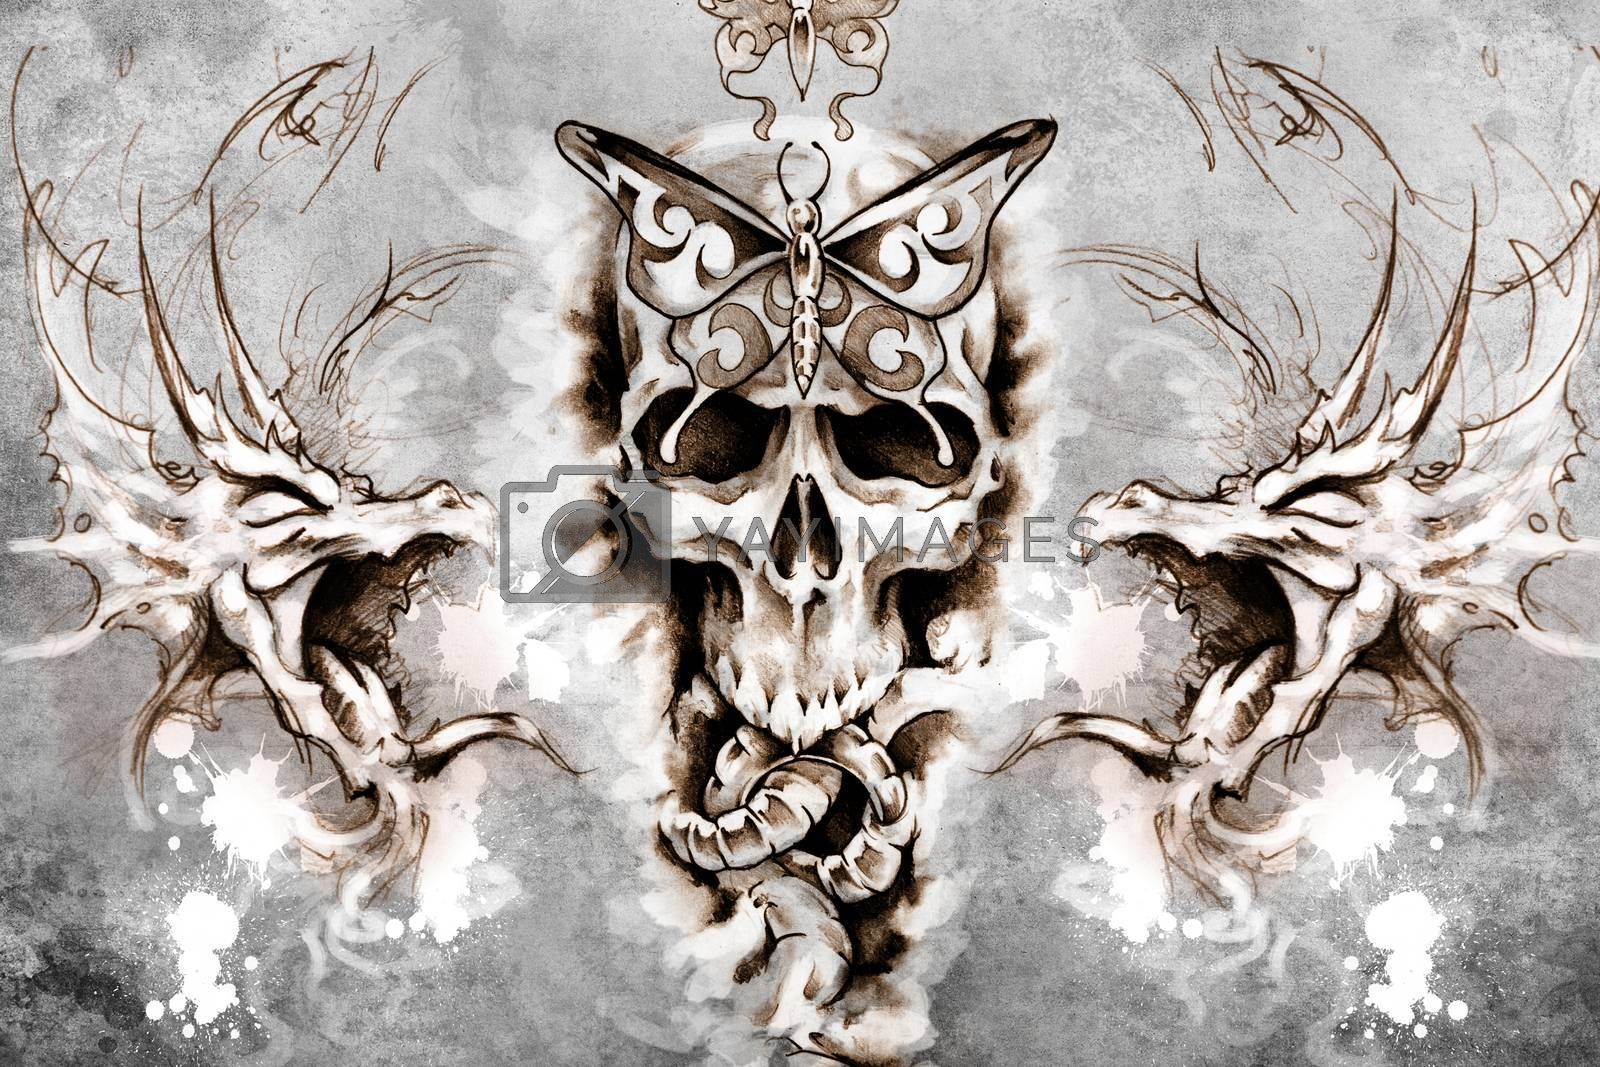 Death Tattoo design over grey background. textured backdrop. Art by FernandoCortes